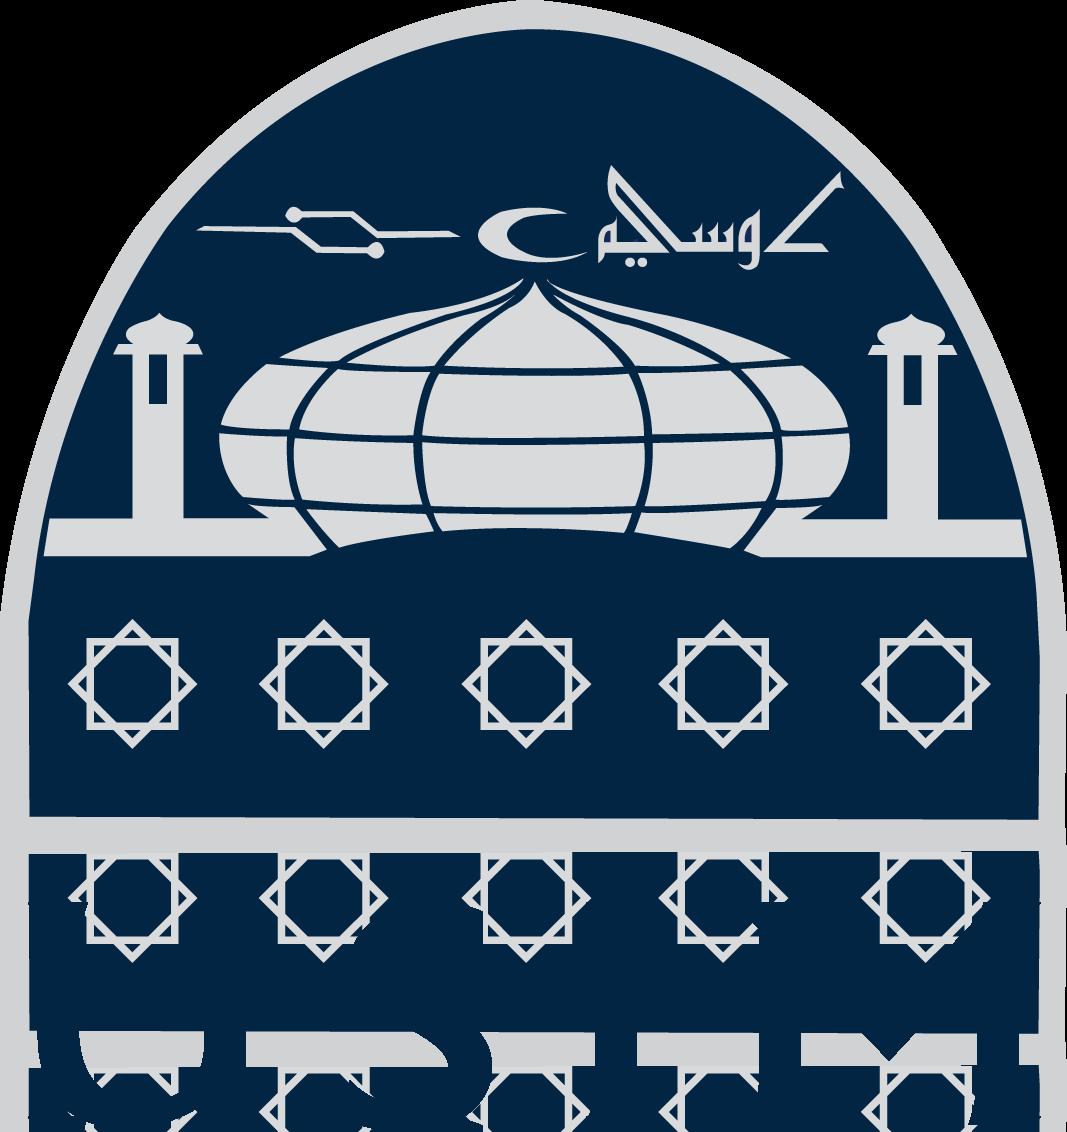 Universiti_Sains_Islam_Malaysia_Logo-جامعة-العلوم-الإسلامية-الماليزية